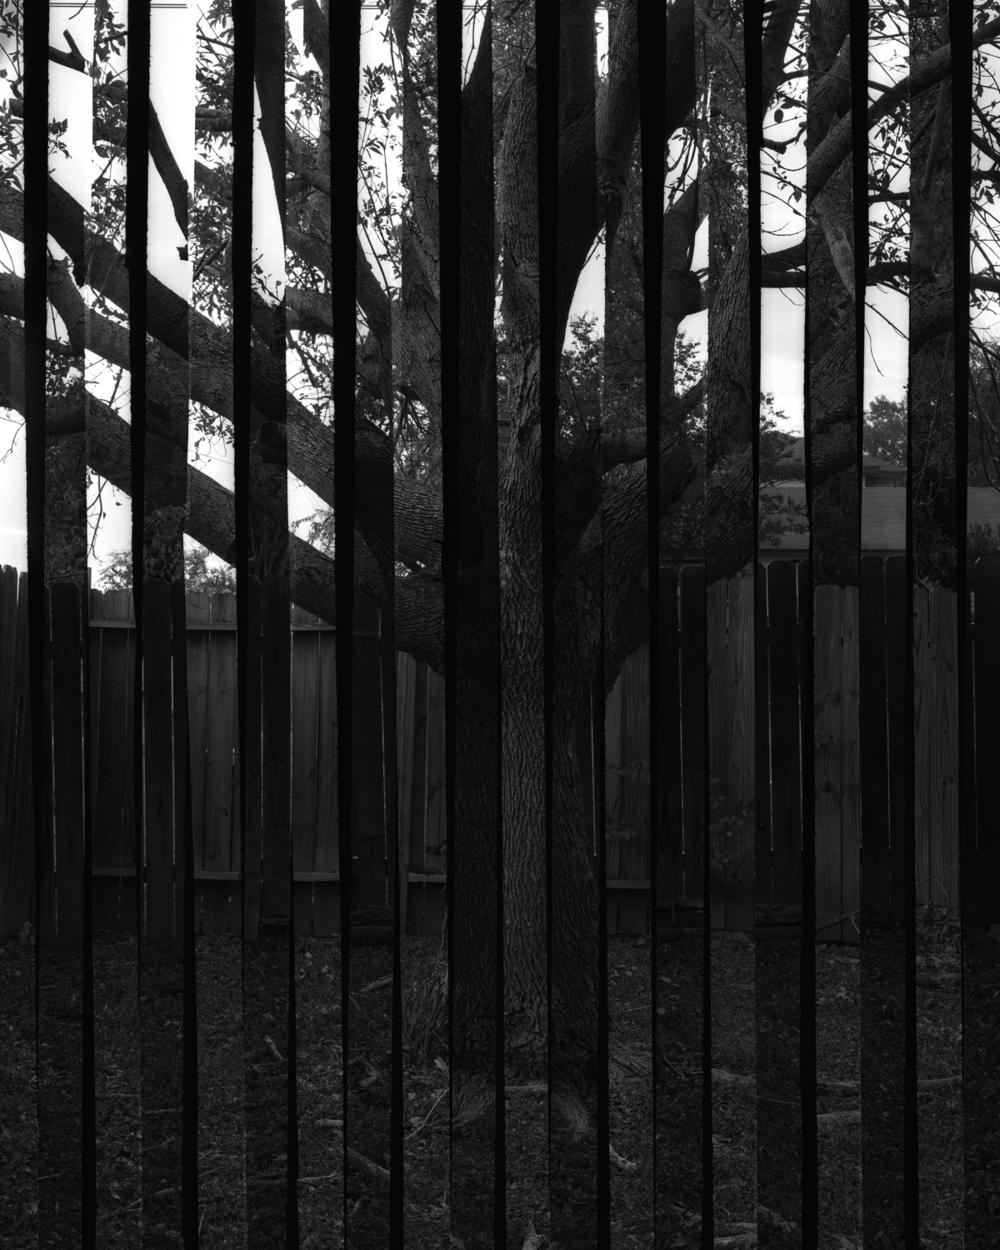 Backyard Tree Double Angle Strips.jpg